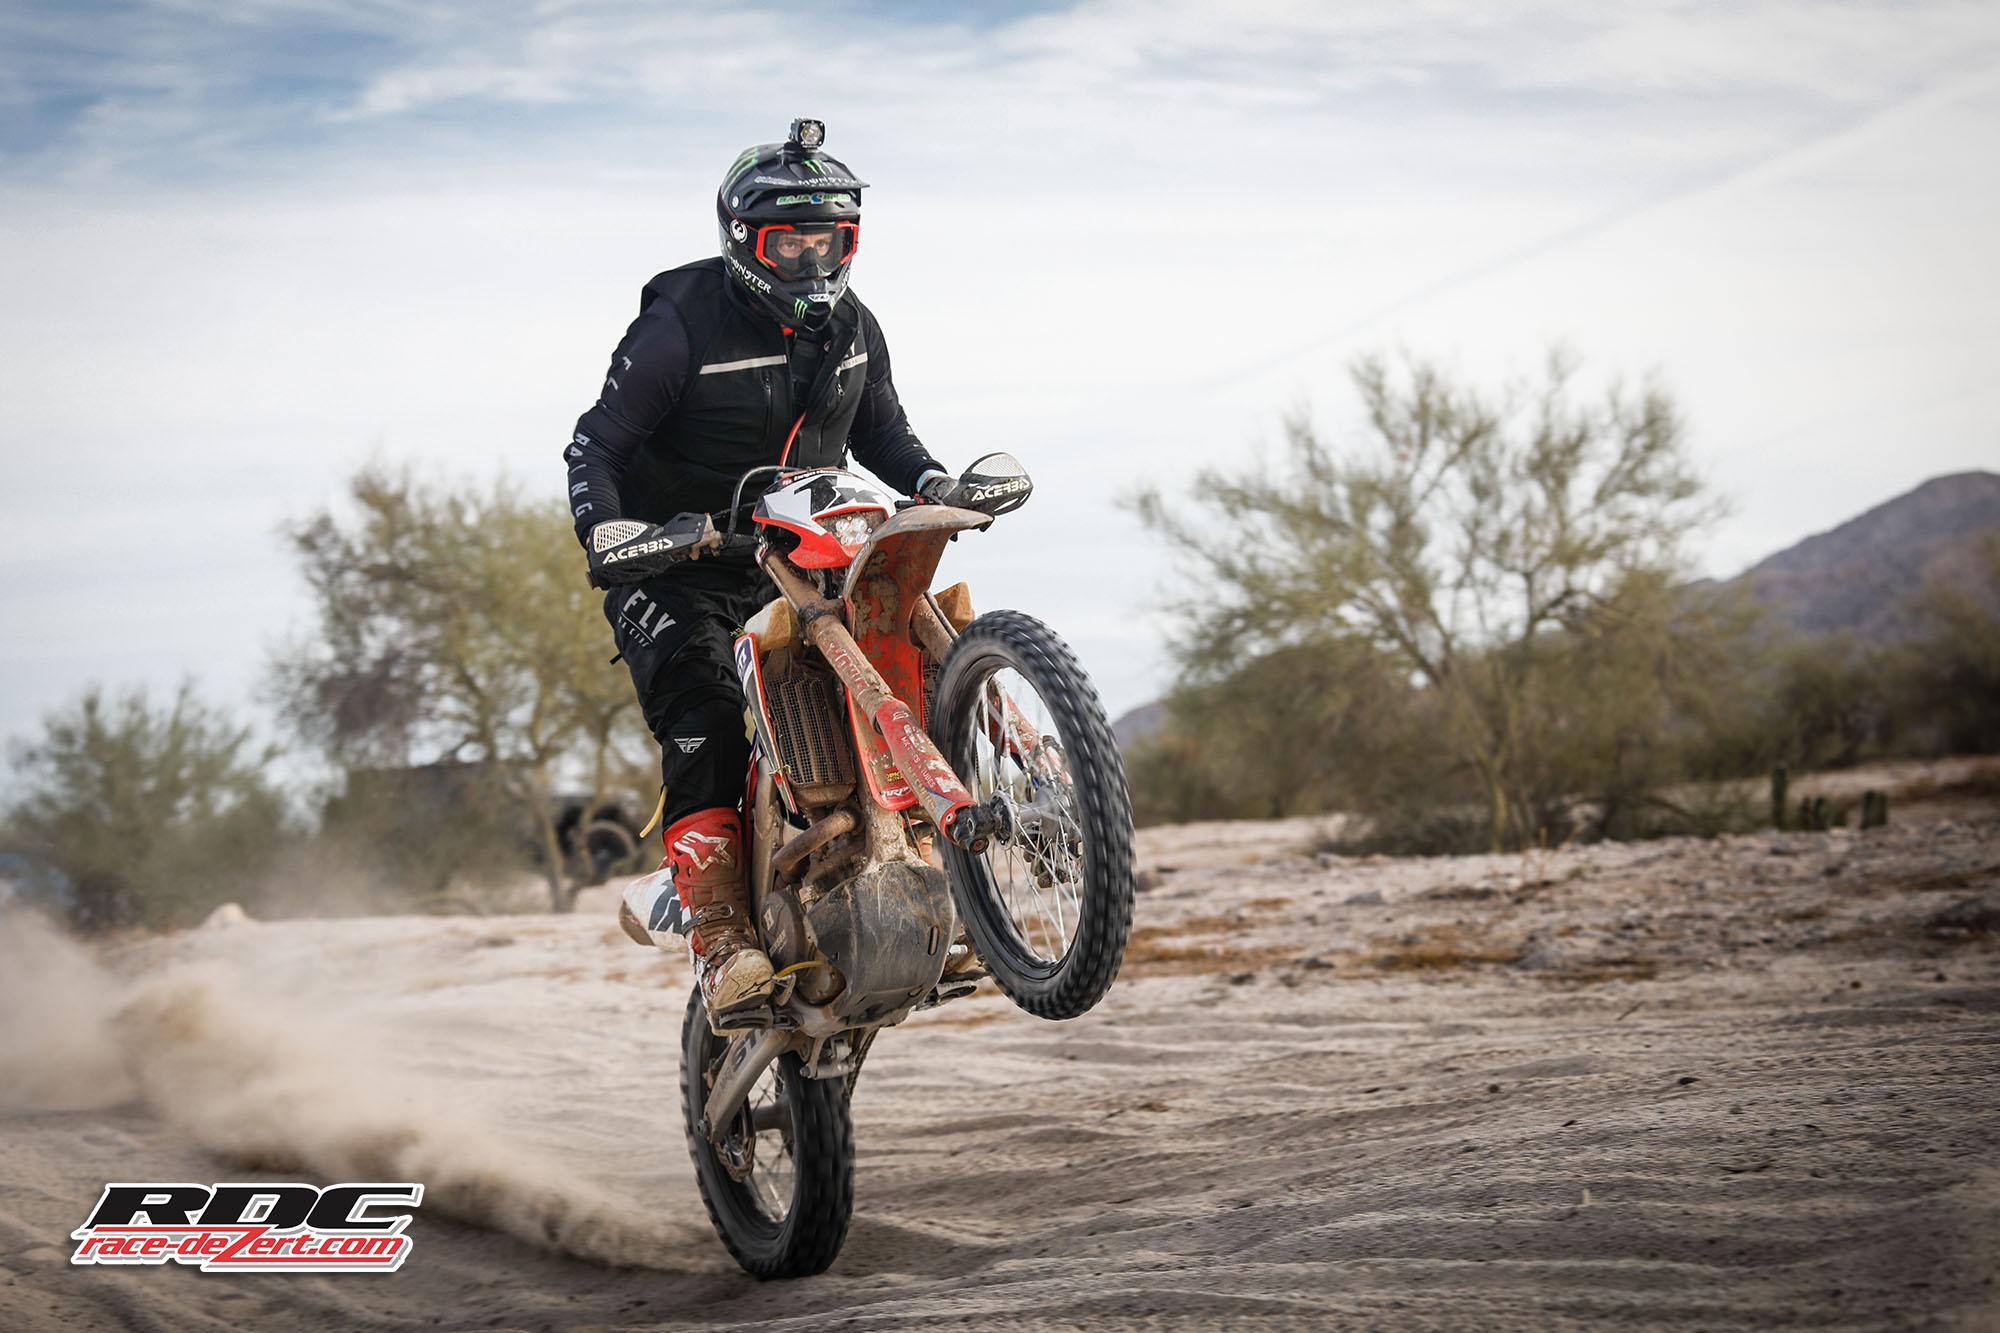 2019-score-baja1000-1x-westx1000-race-dezert-004.jpg